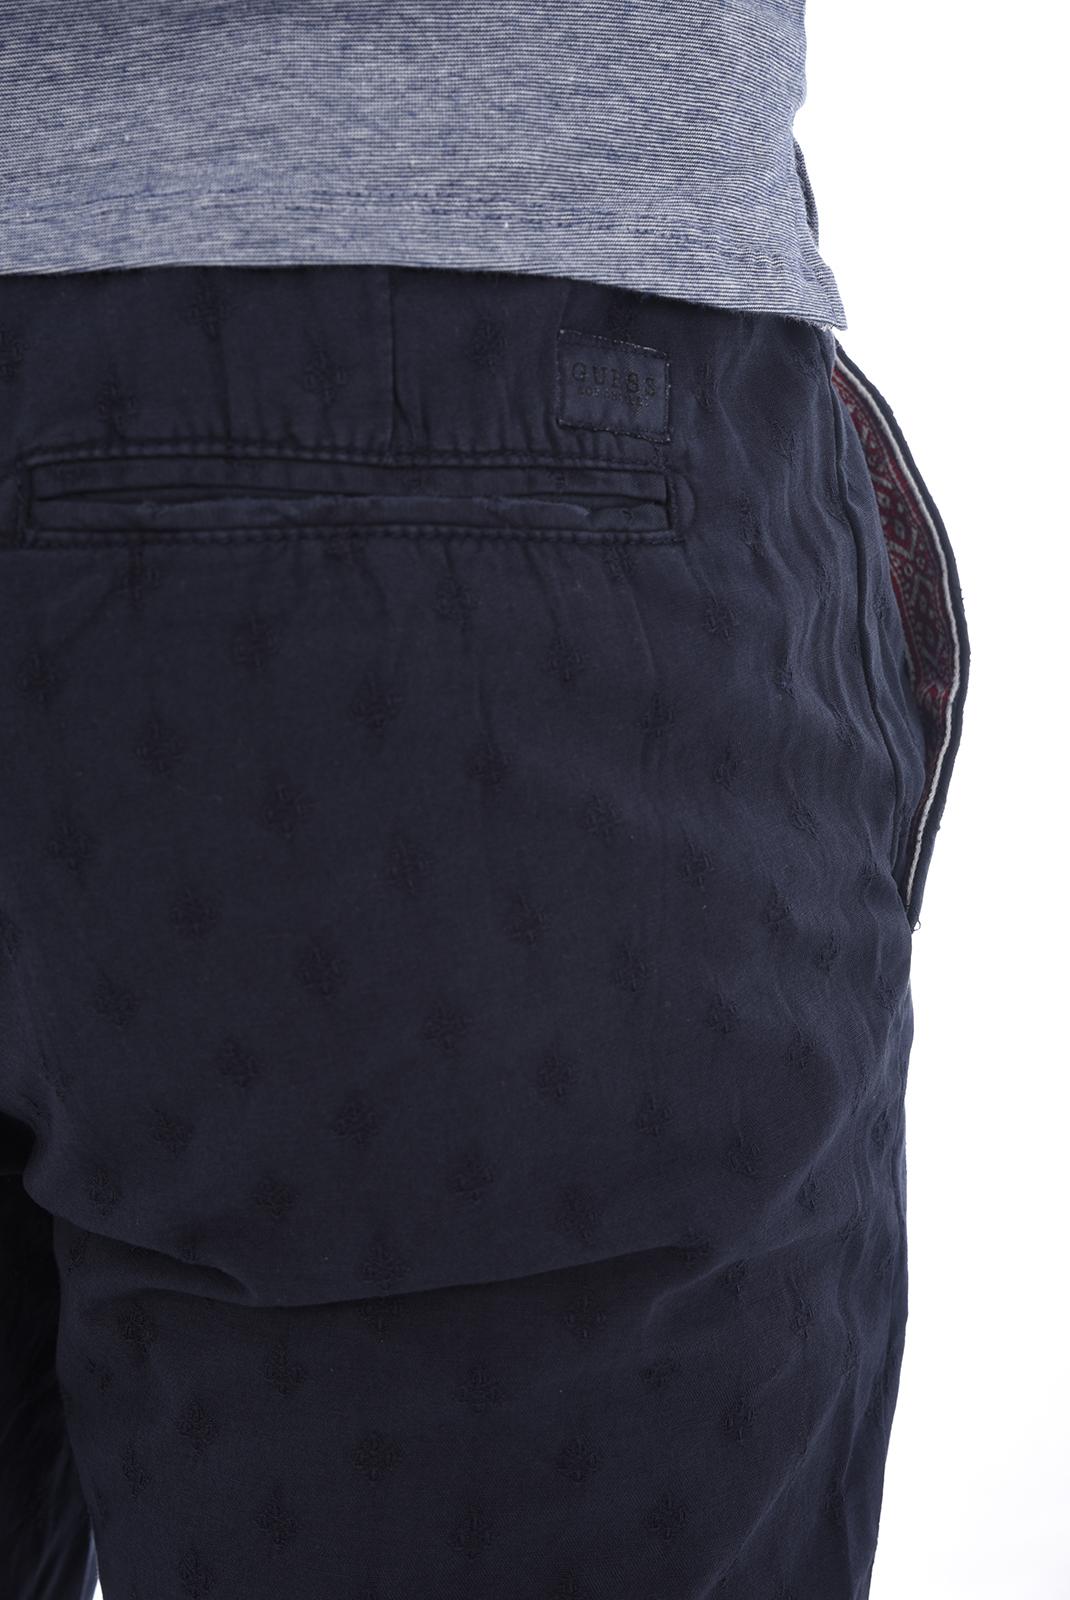 Pantalons chino/citadin  Guess jeans M82B10 W9VA0 G720 BLEU